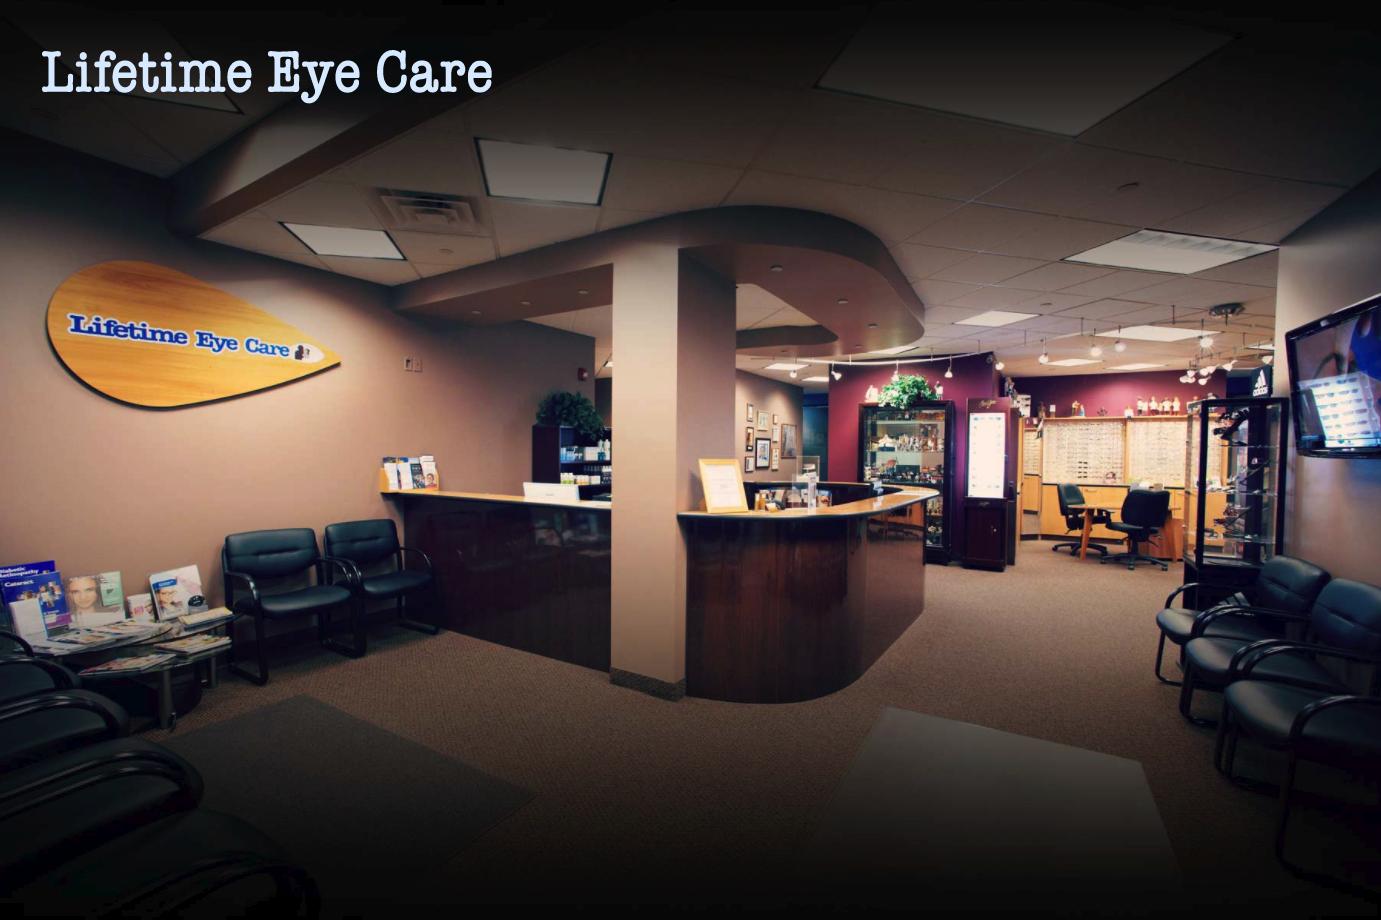 Lifetime Eye Care image 3